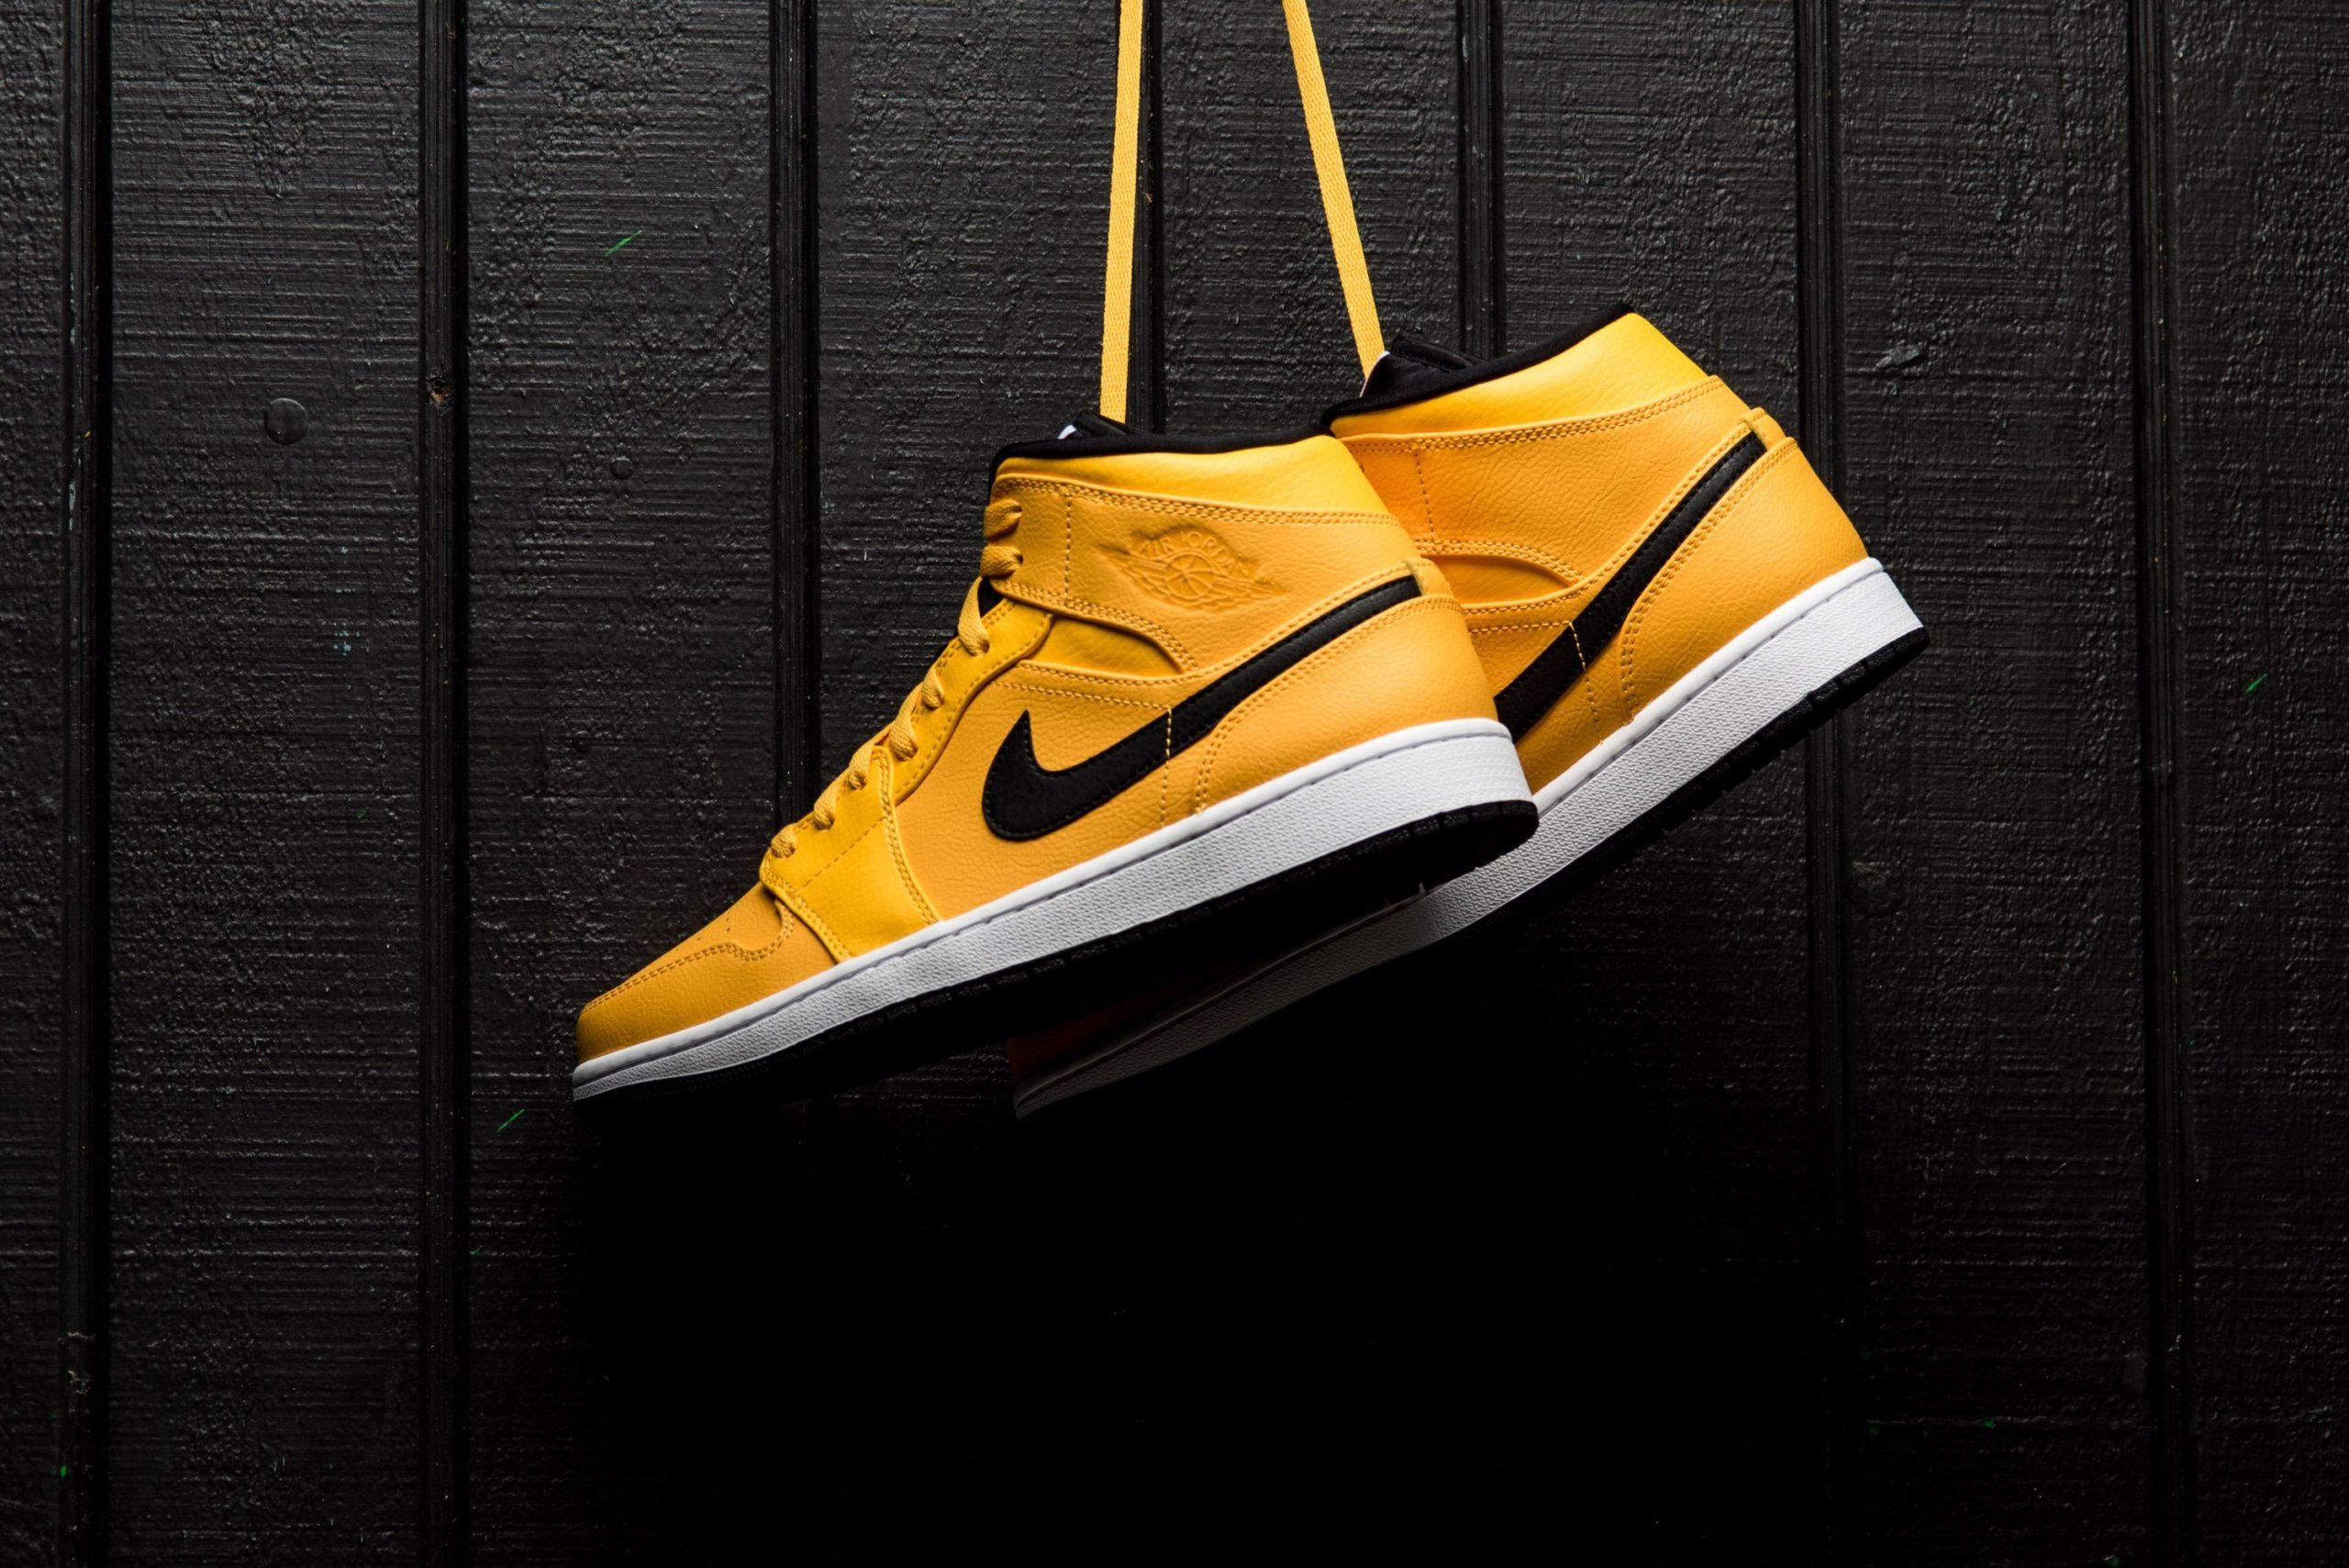 Gouden Jordan 1 mid zwarte swoosh